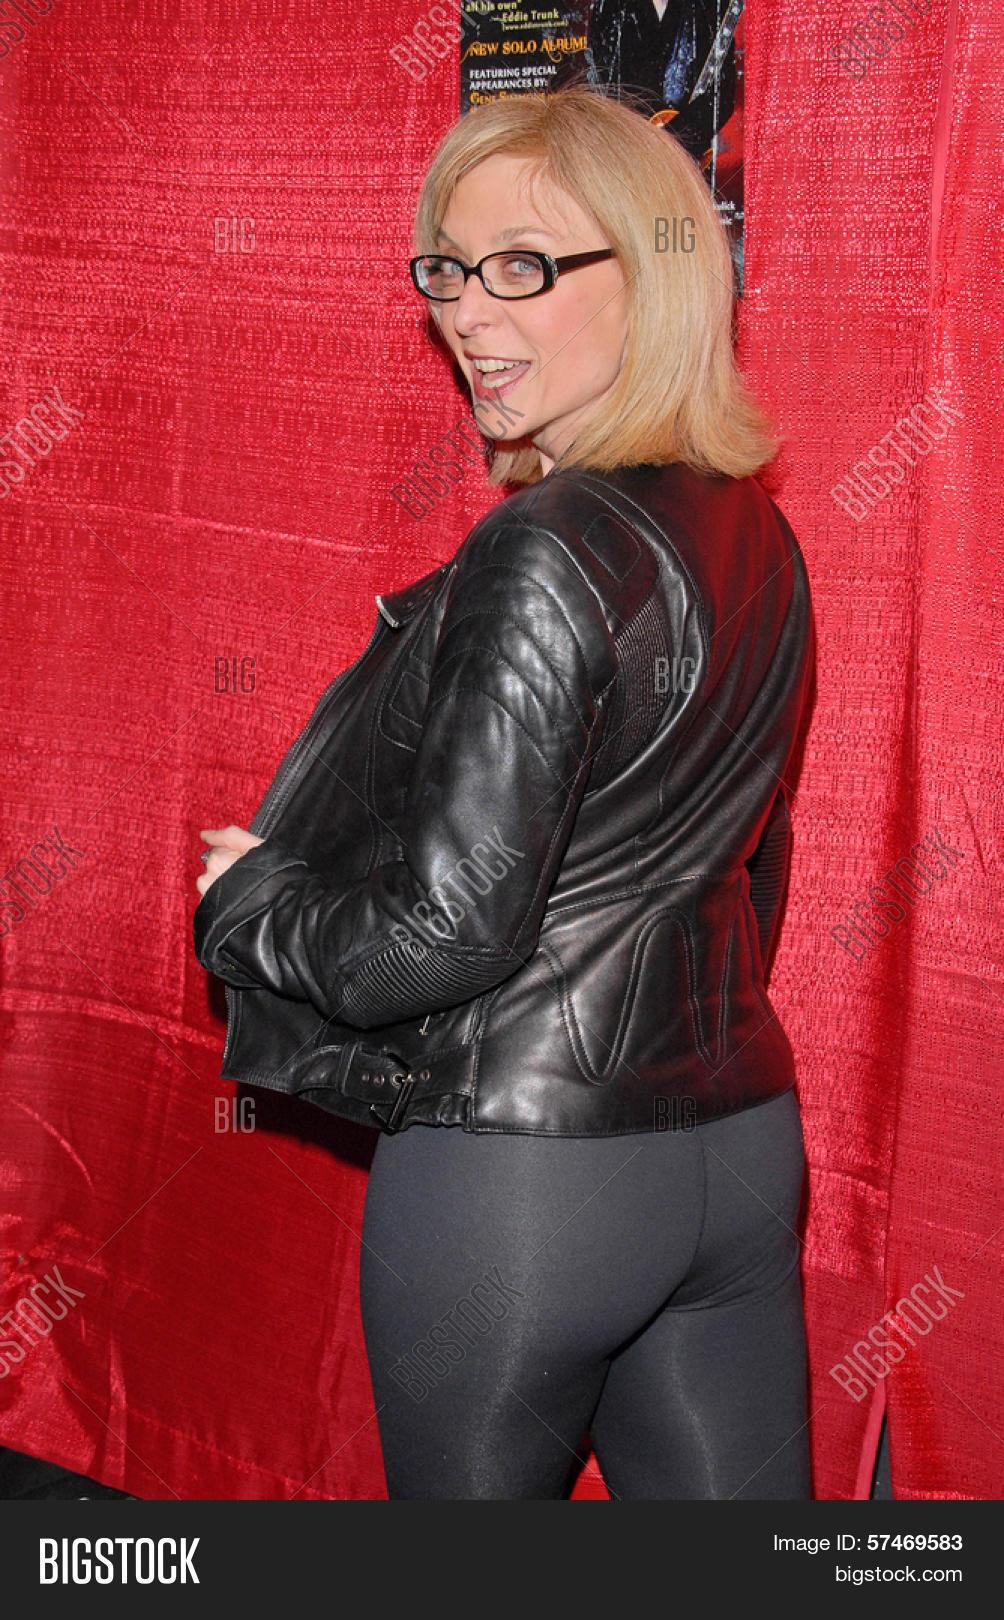 Nina Hartley Celebrity Karaoke Us Image Amp Photo Bigstock